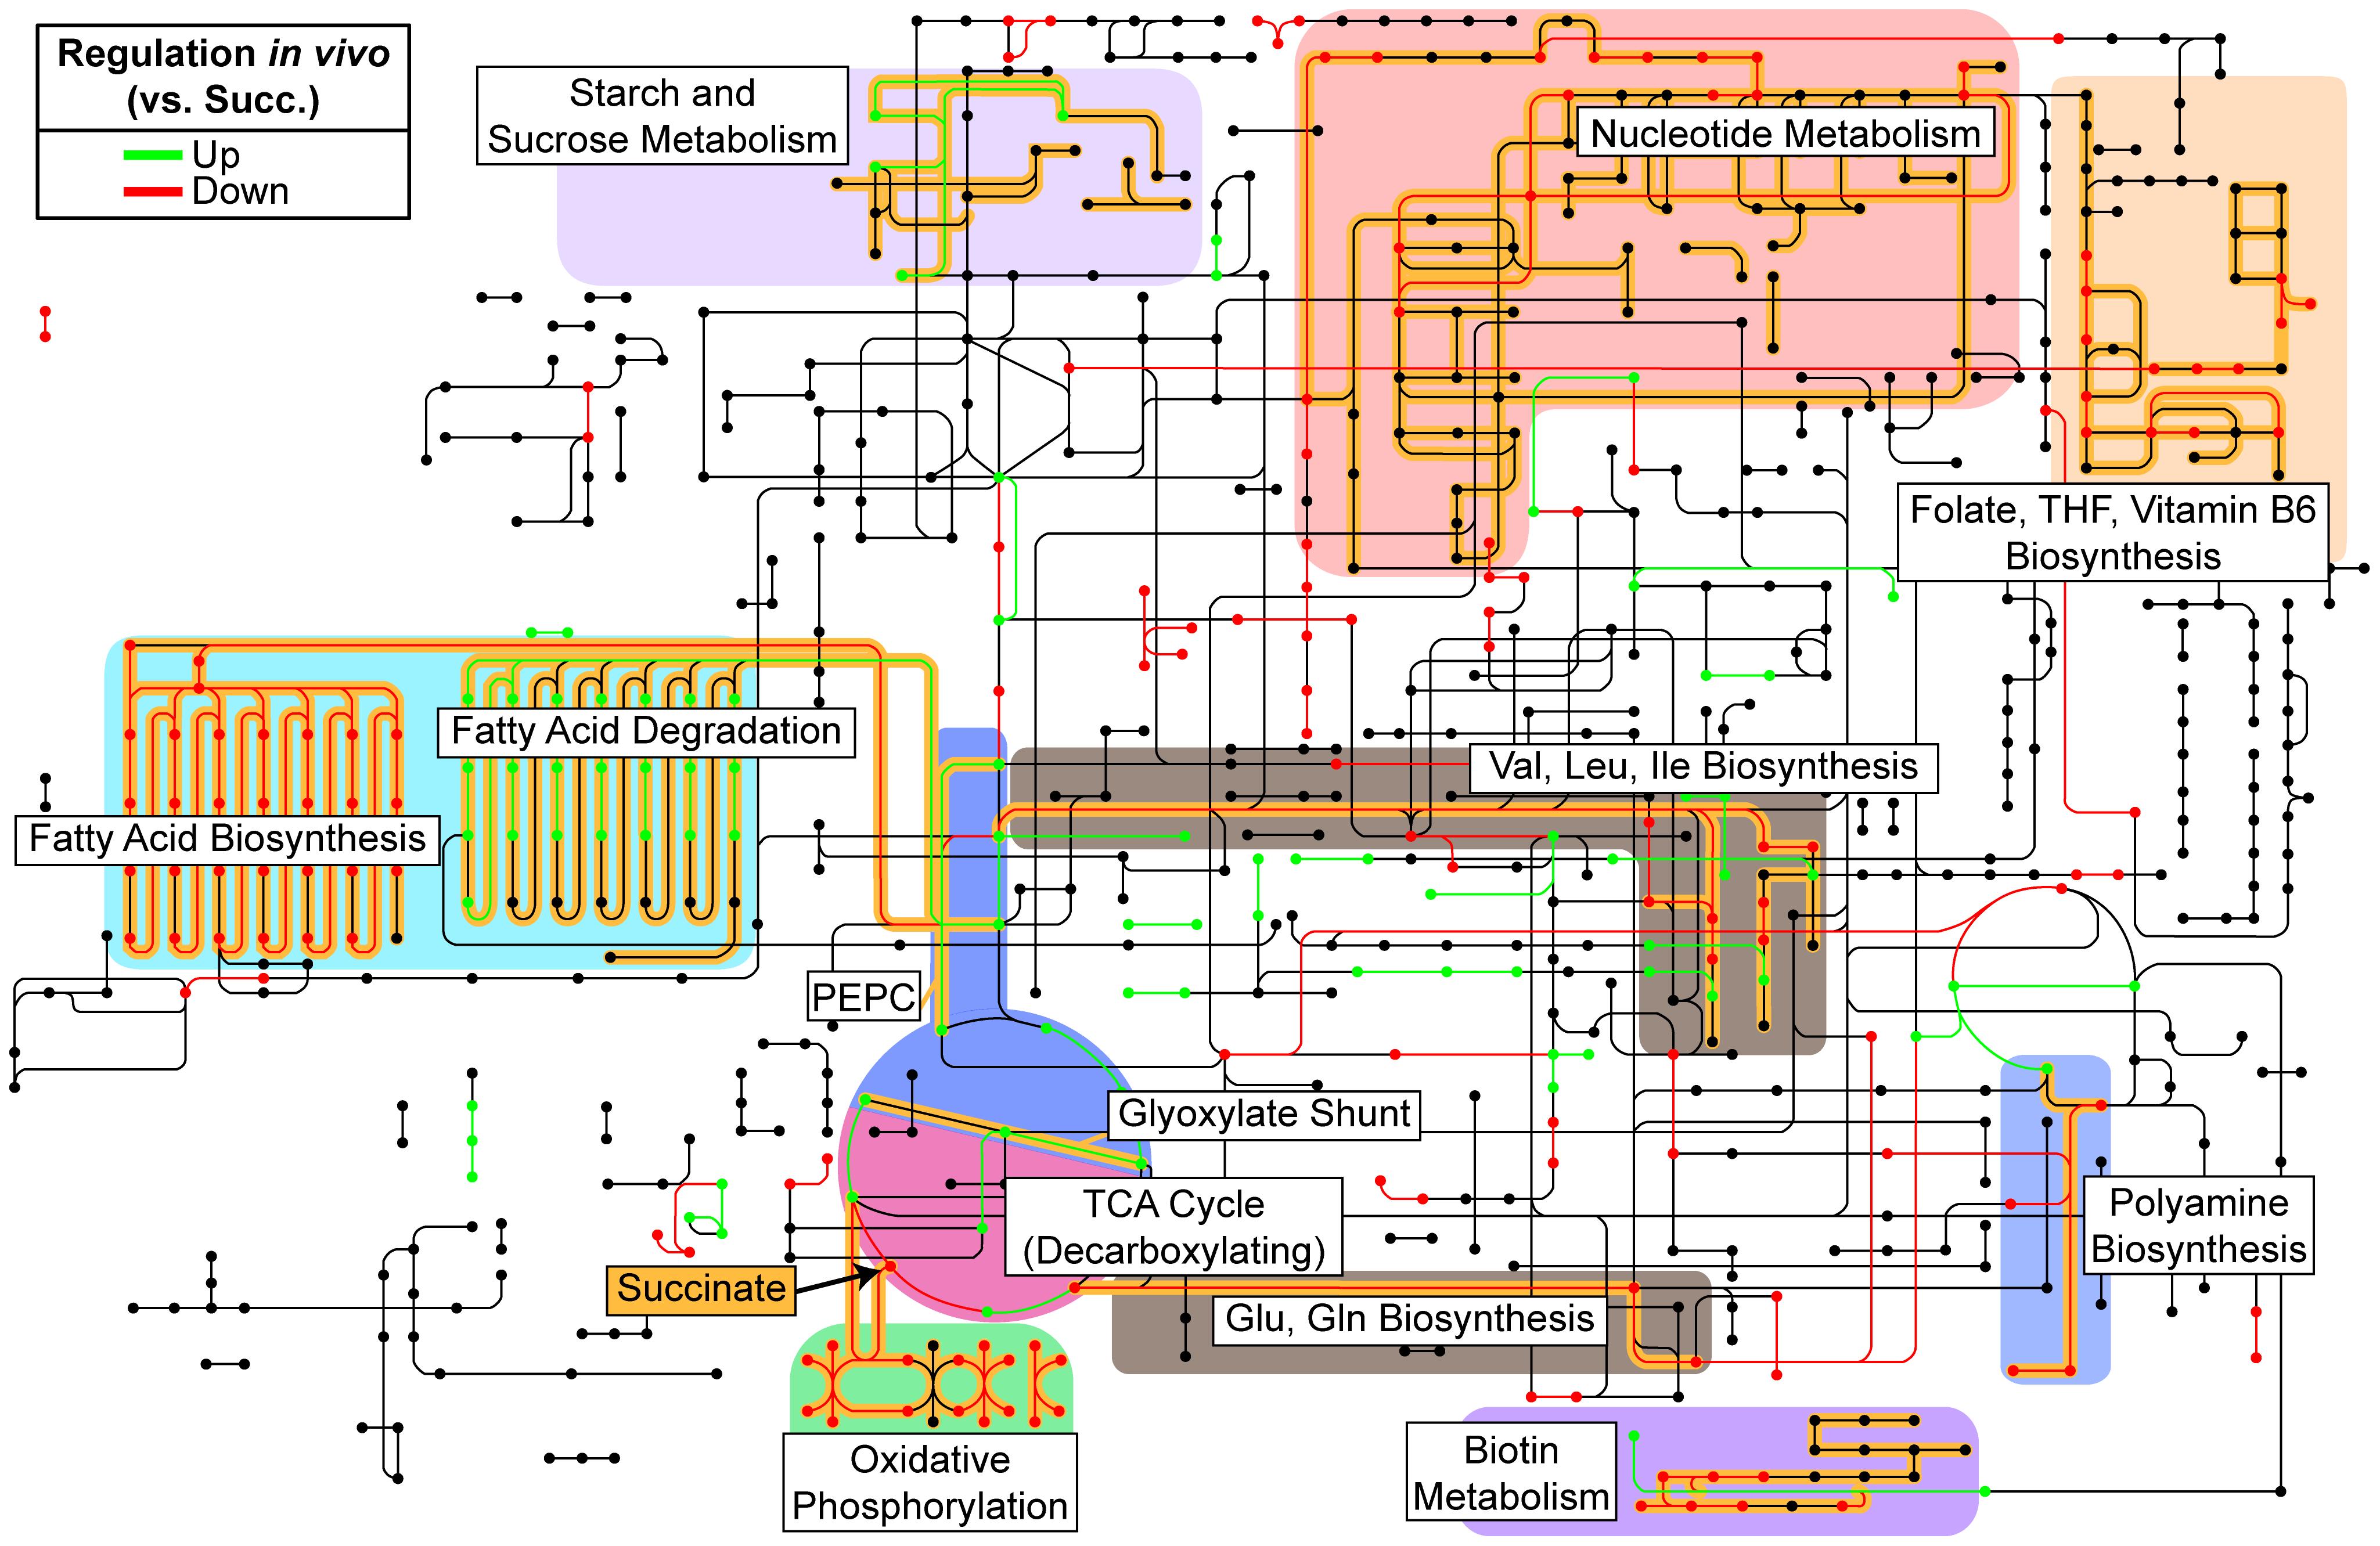 Reconstruction of <i>in vivo</i> metabolism from RNA-seq data.